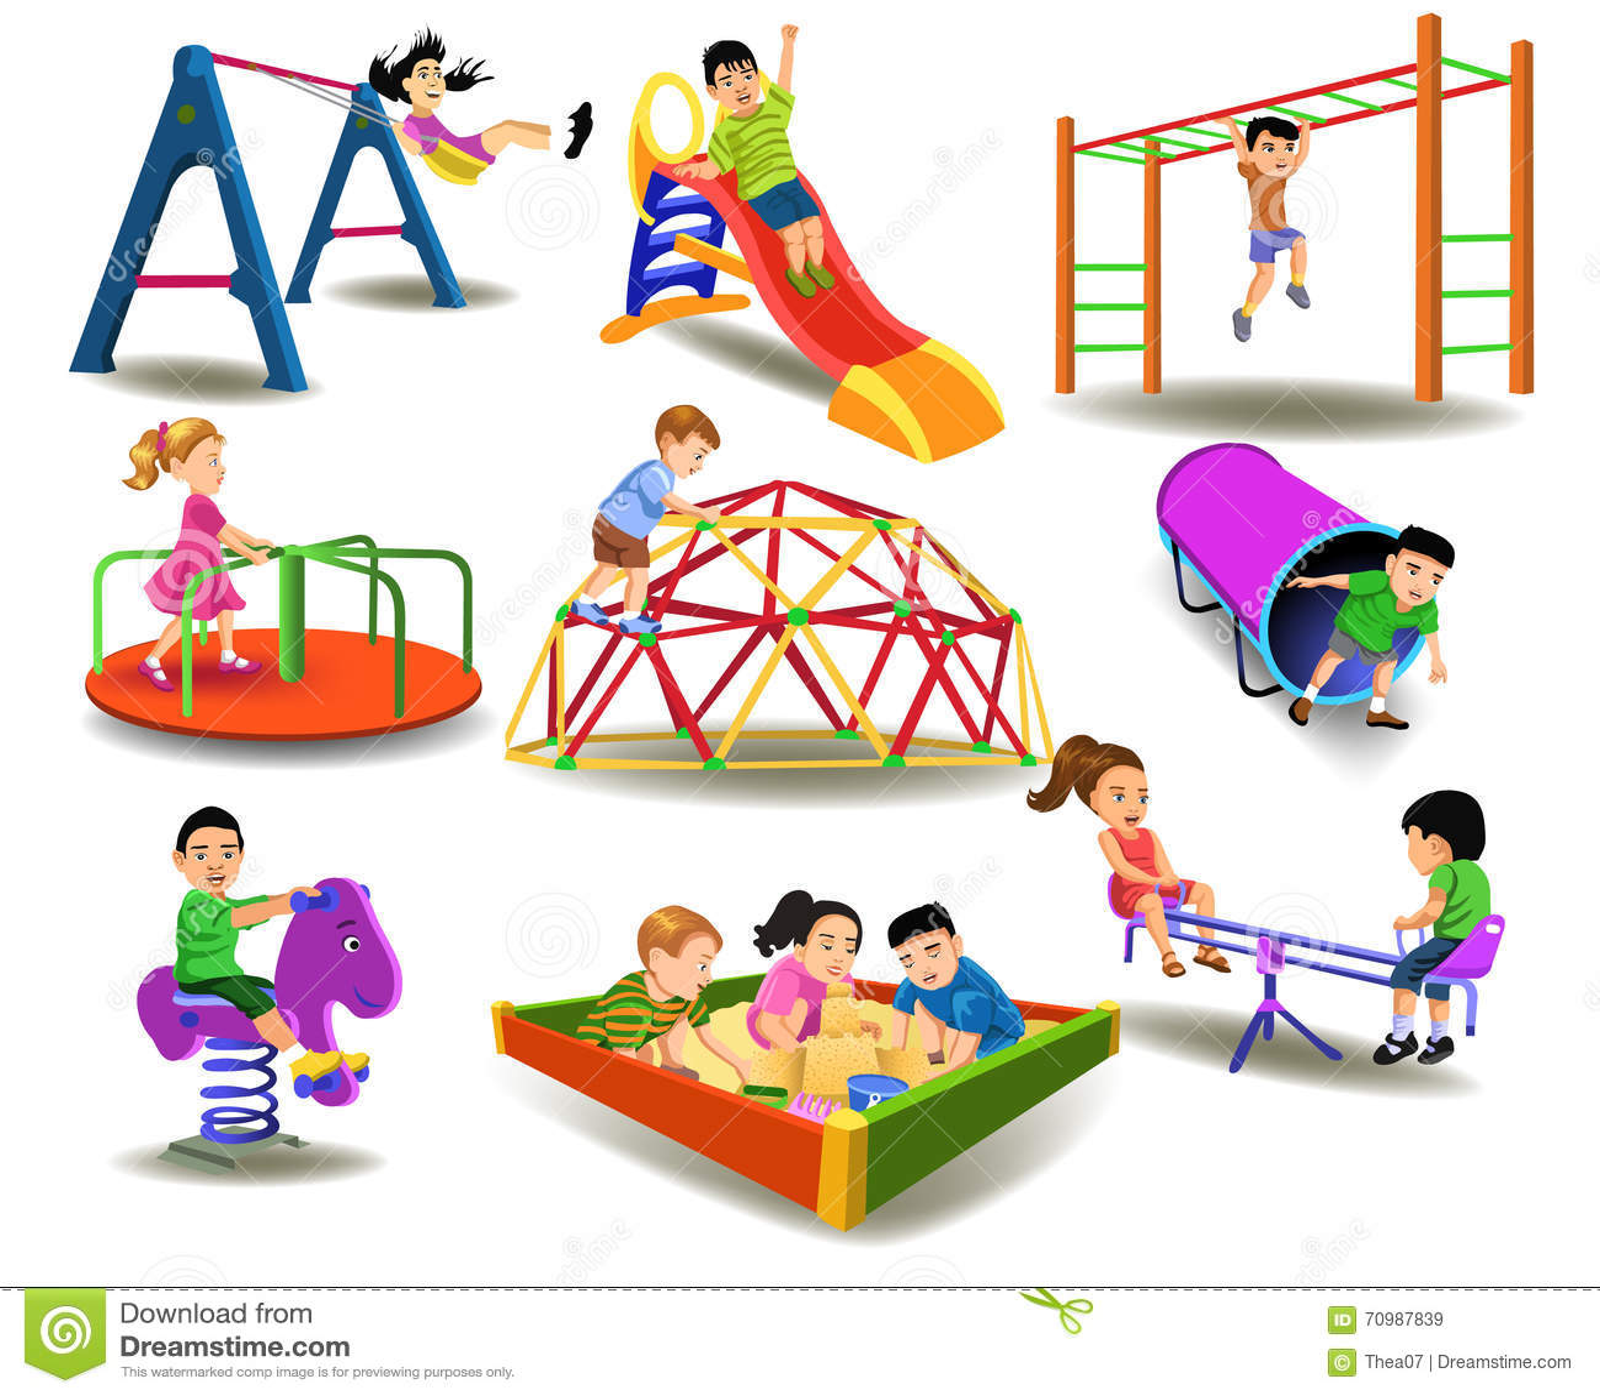 Children Having Fun At The Playground Stock Vector Image